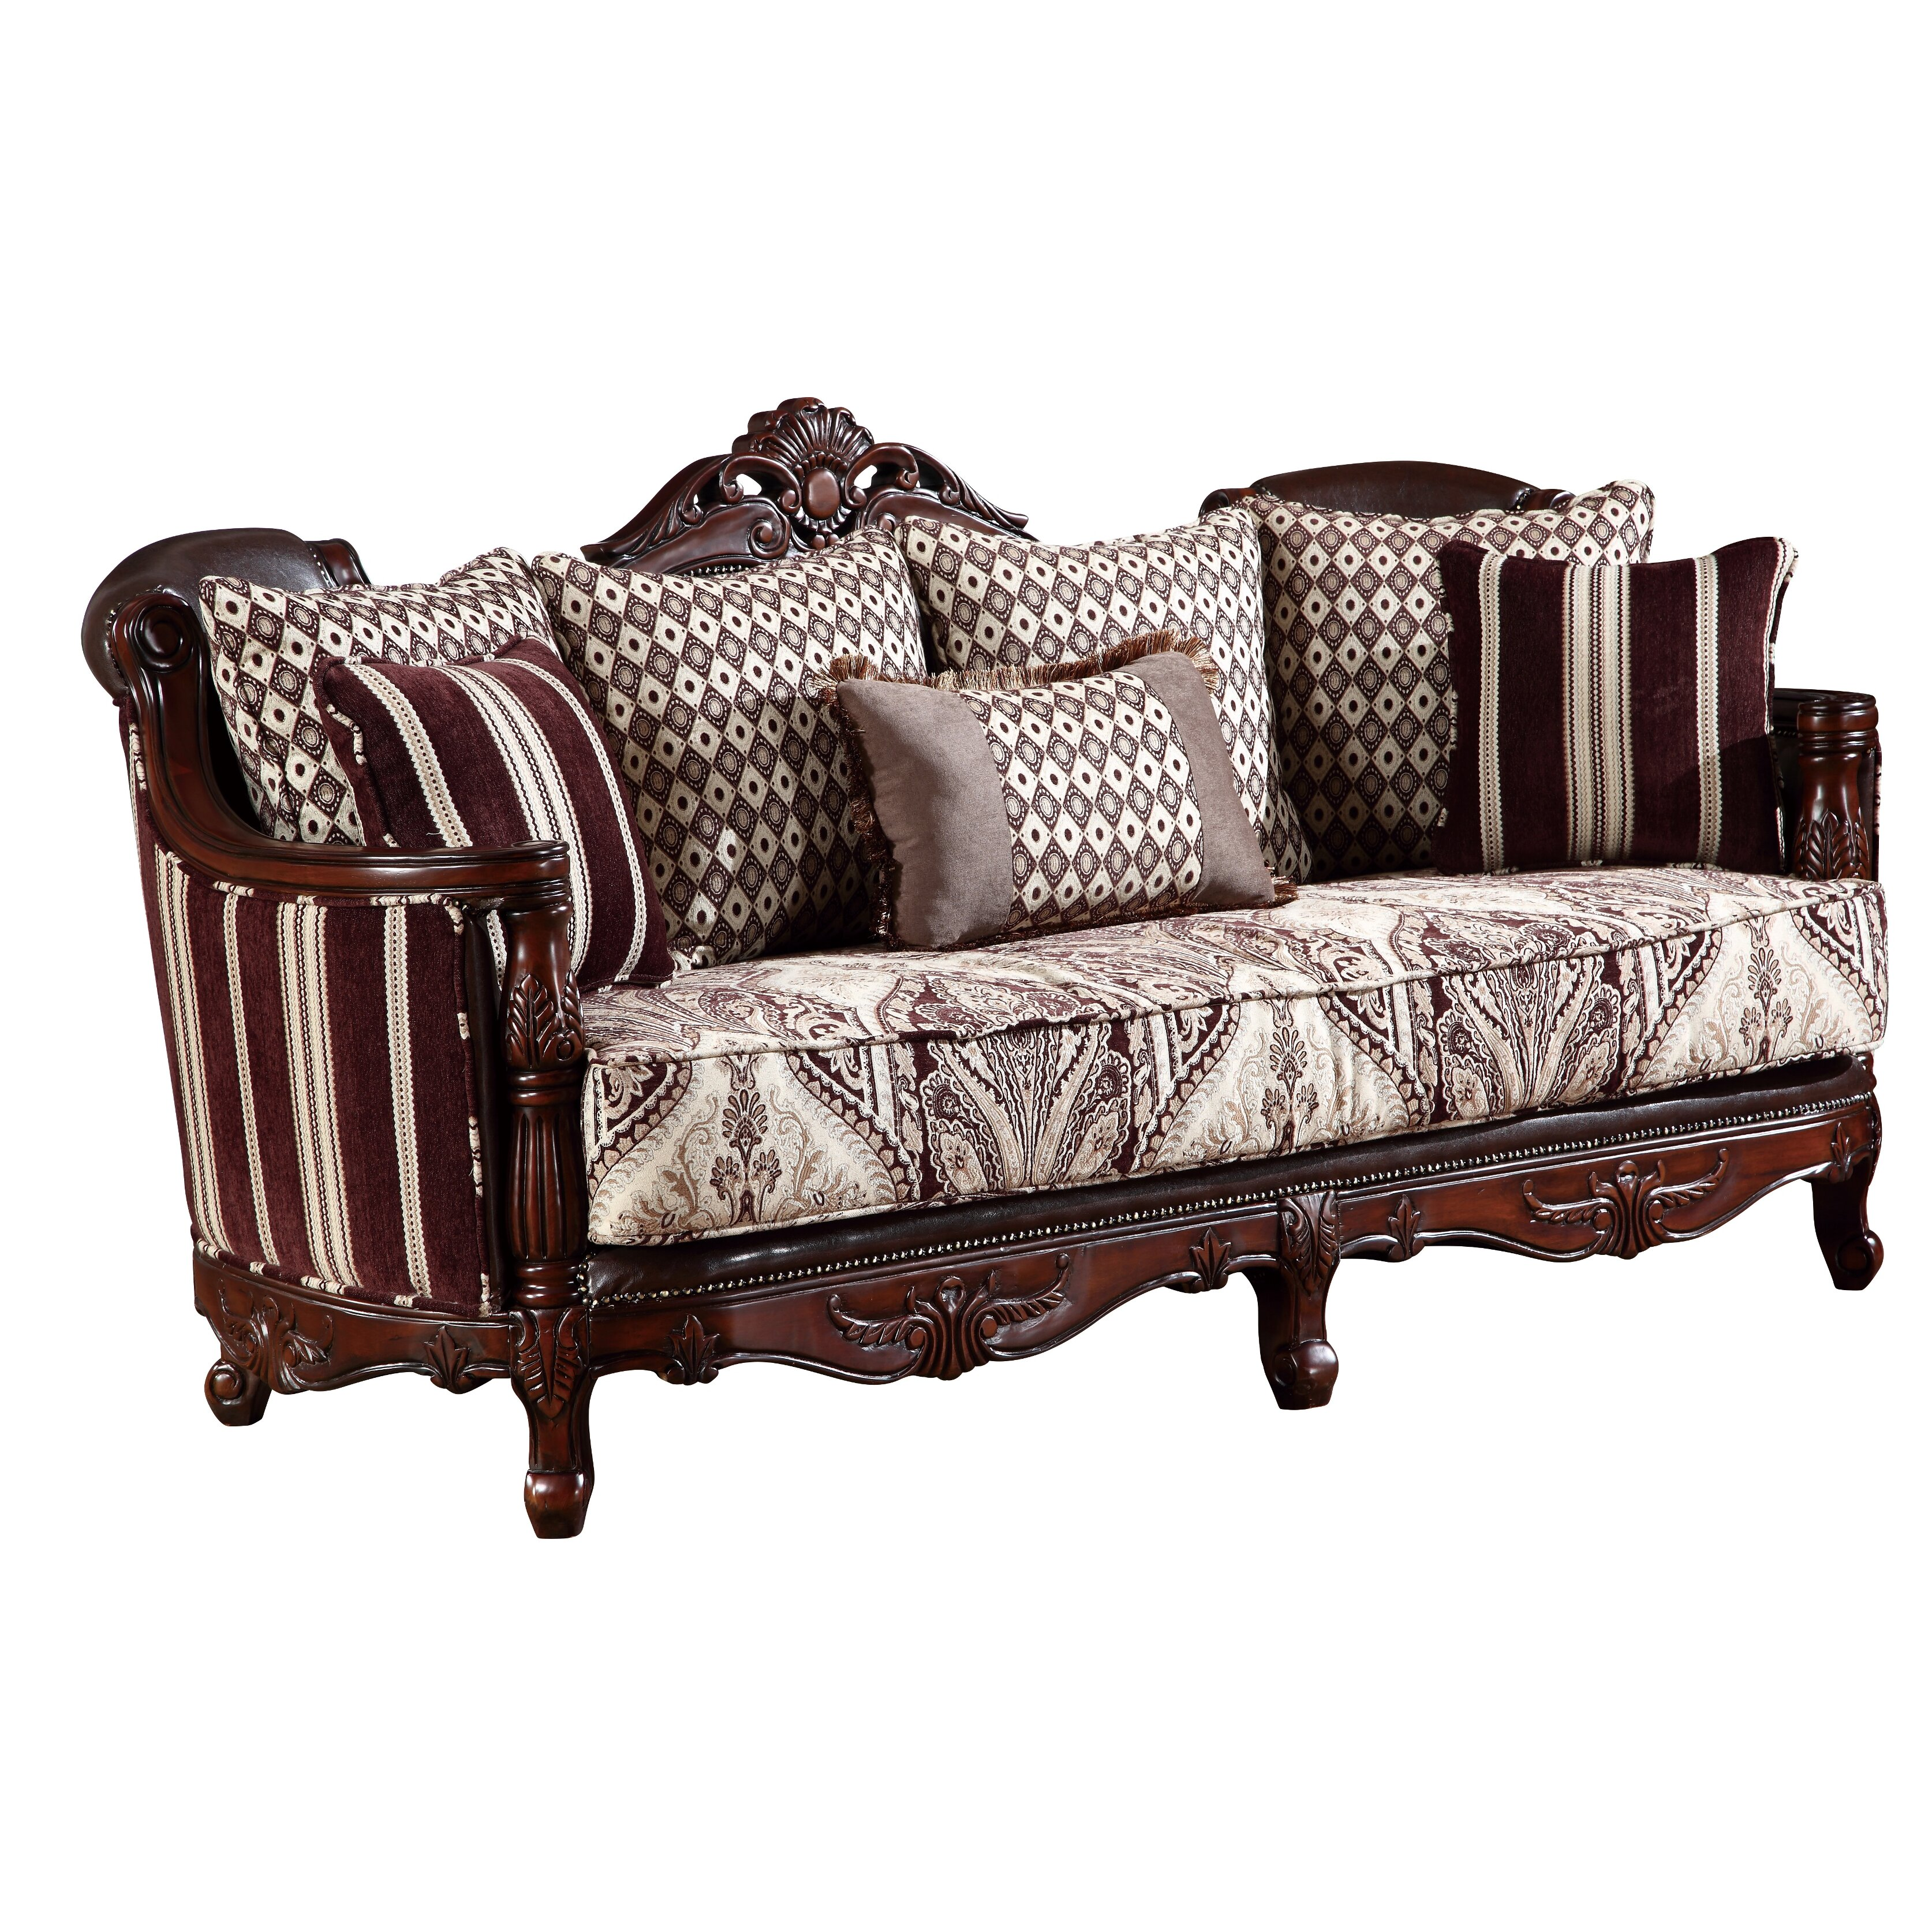 Global furniture usa home interior design for Divan furniture usa